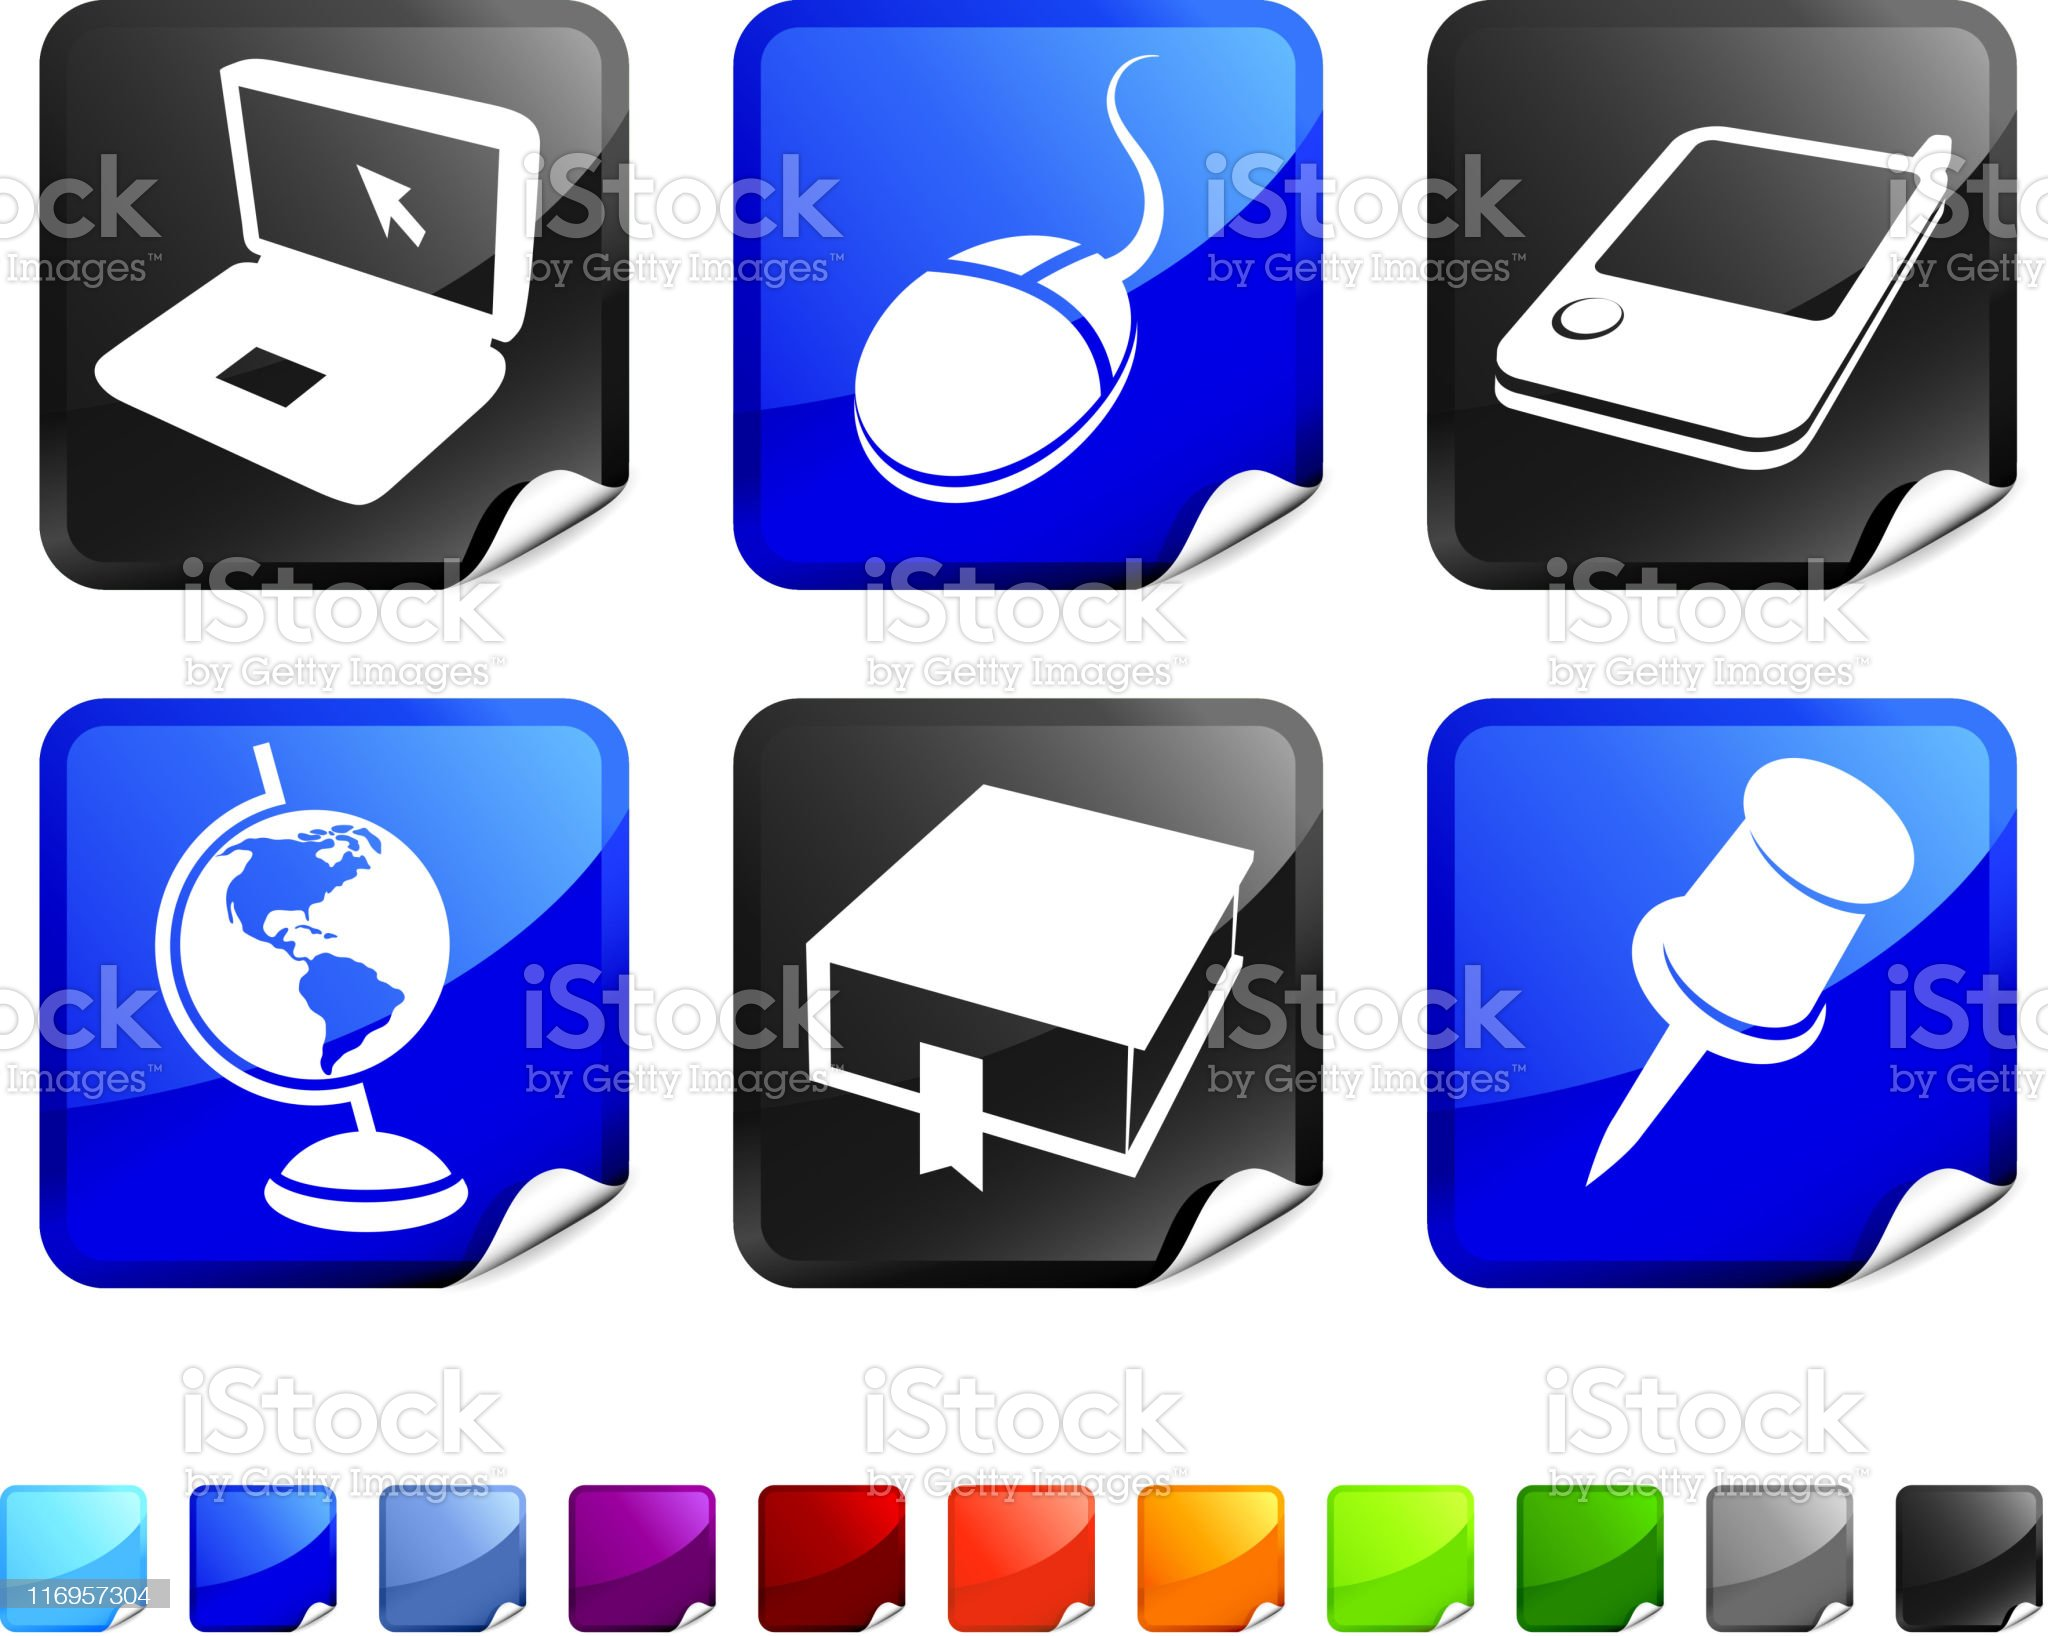 information royalty free vector icon set royalty-free stock vector art